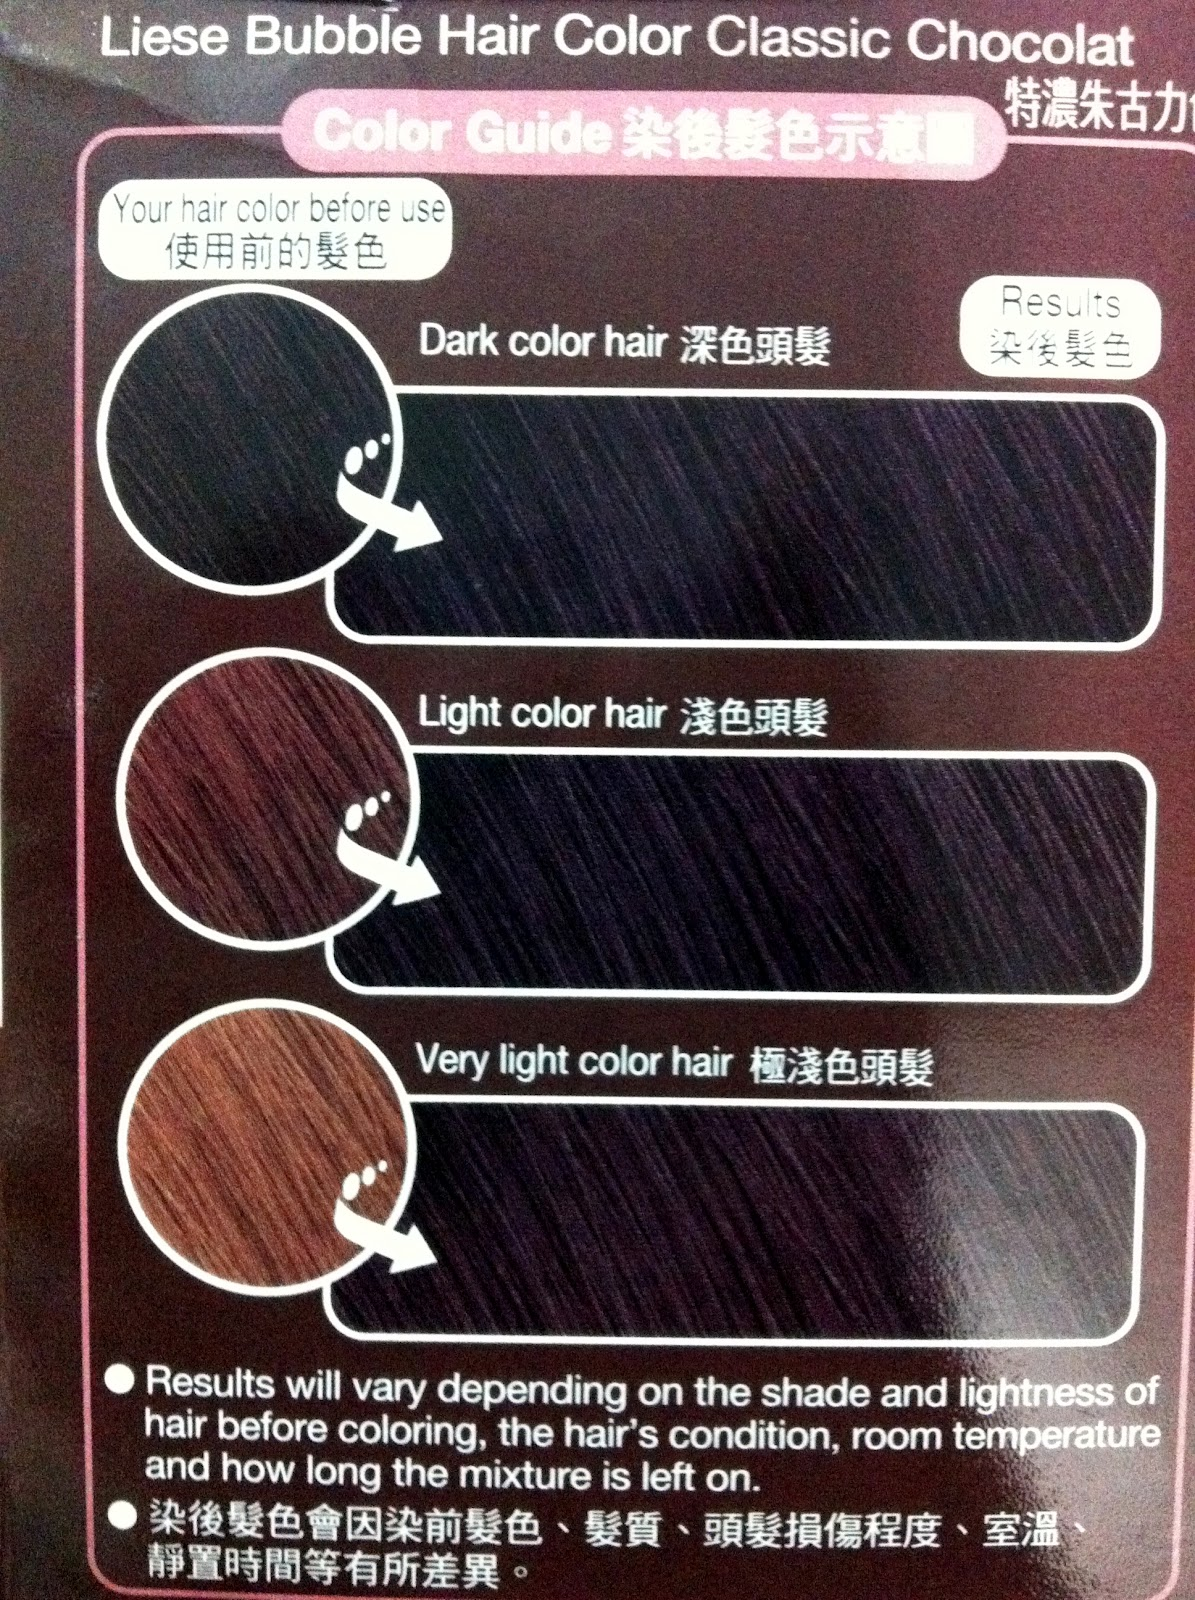 Liese Bubble Hair Dye Classic Chocolate